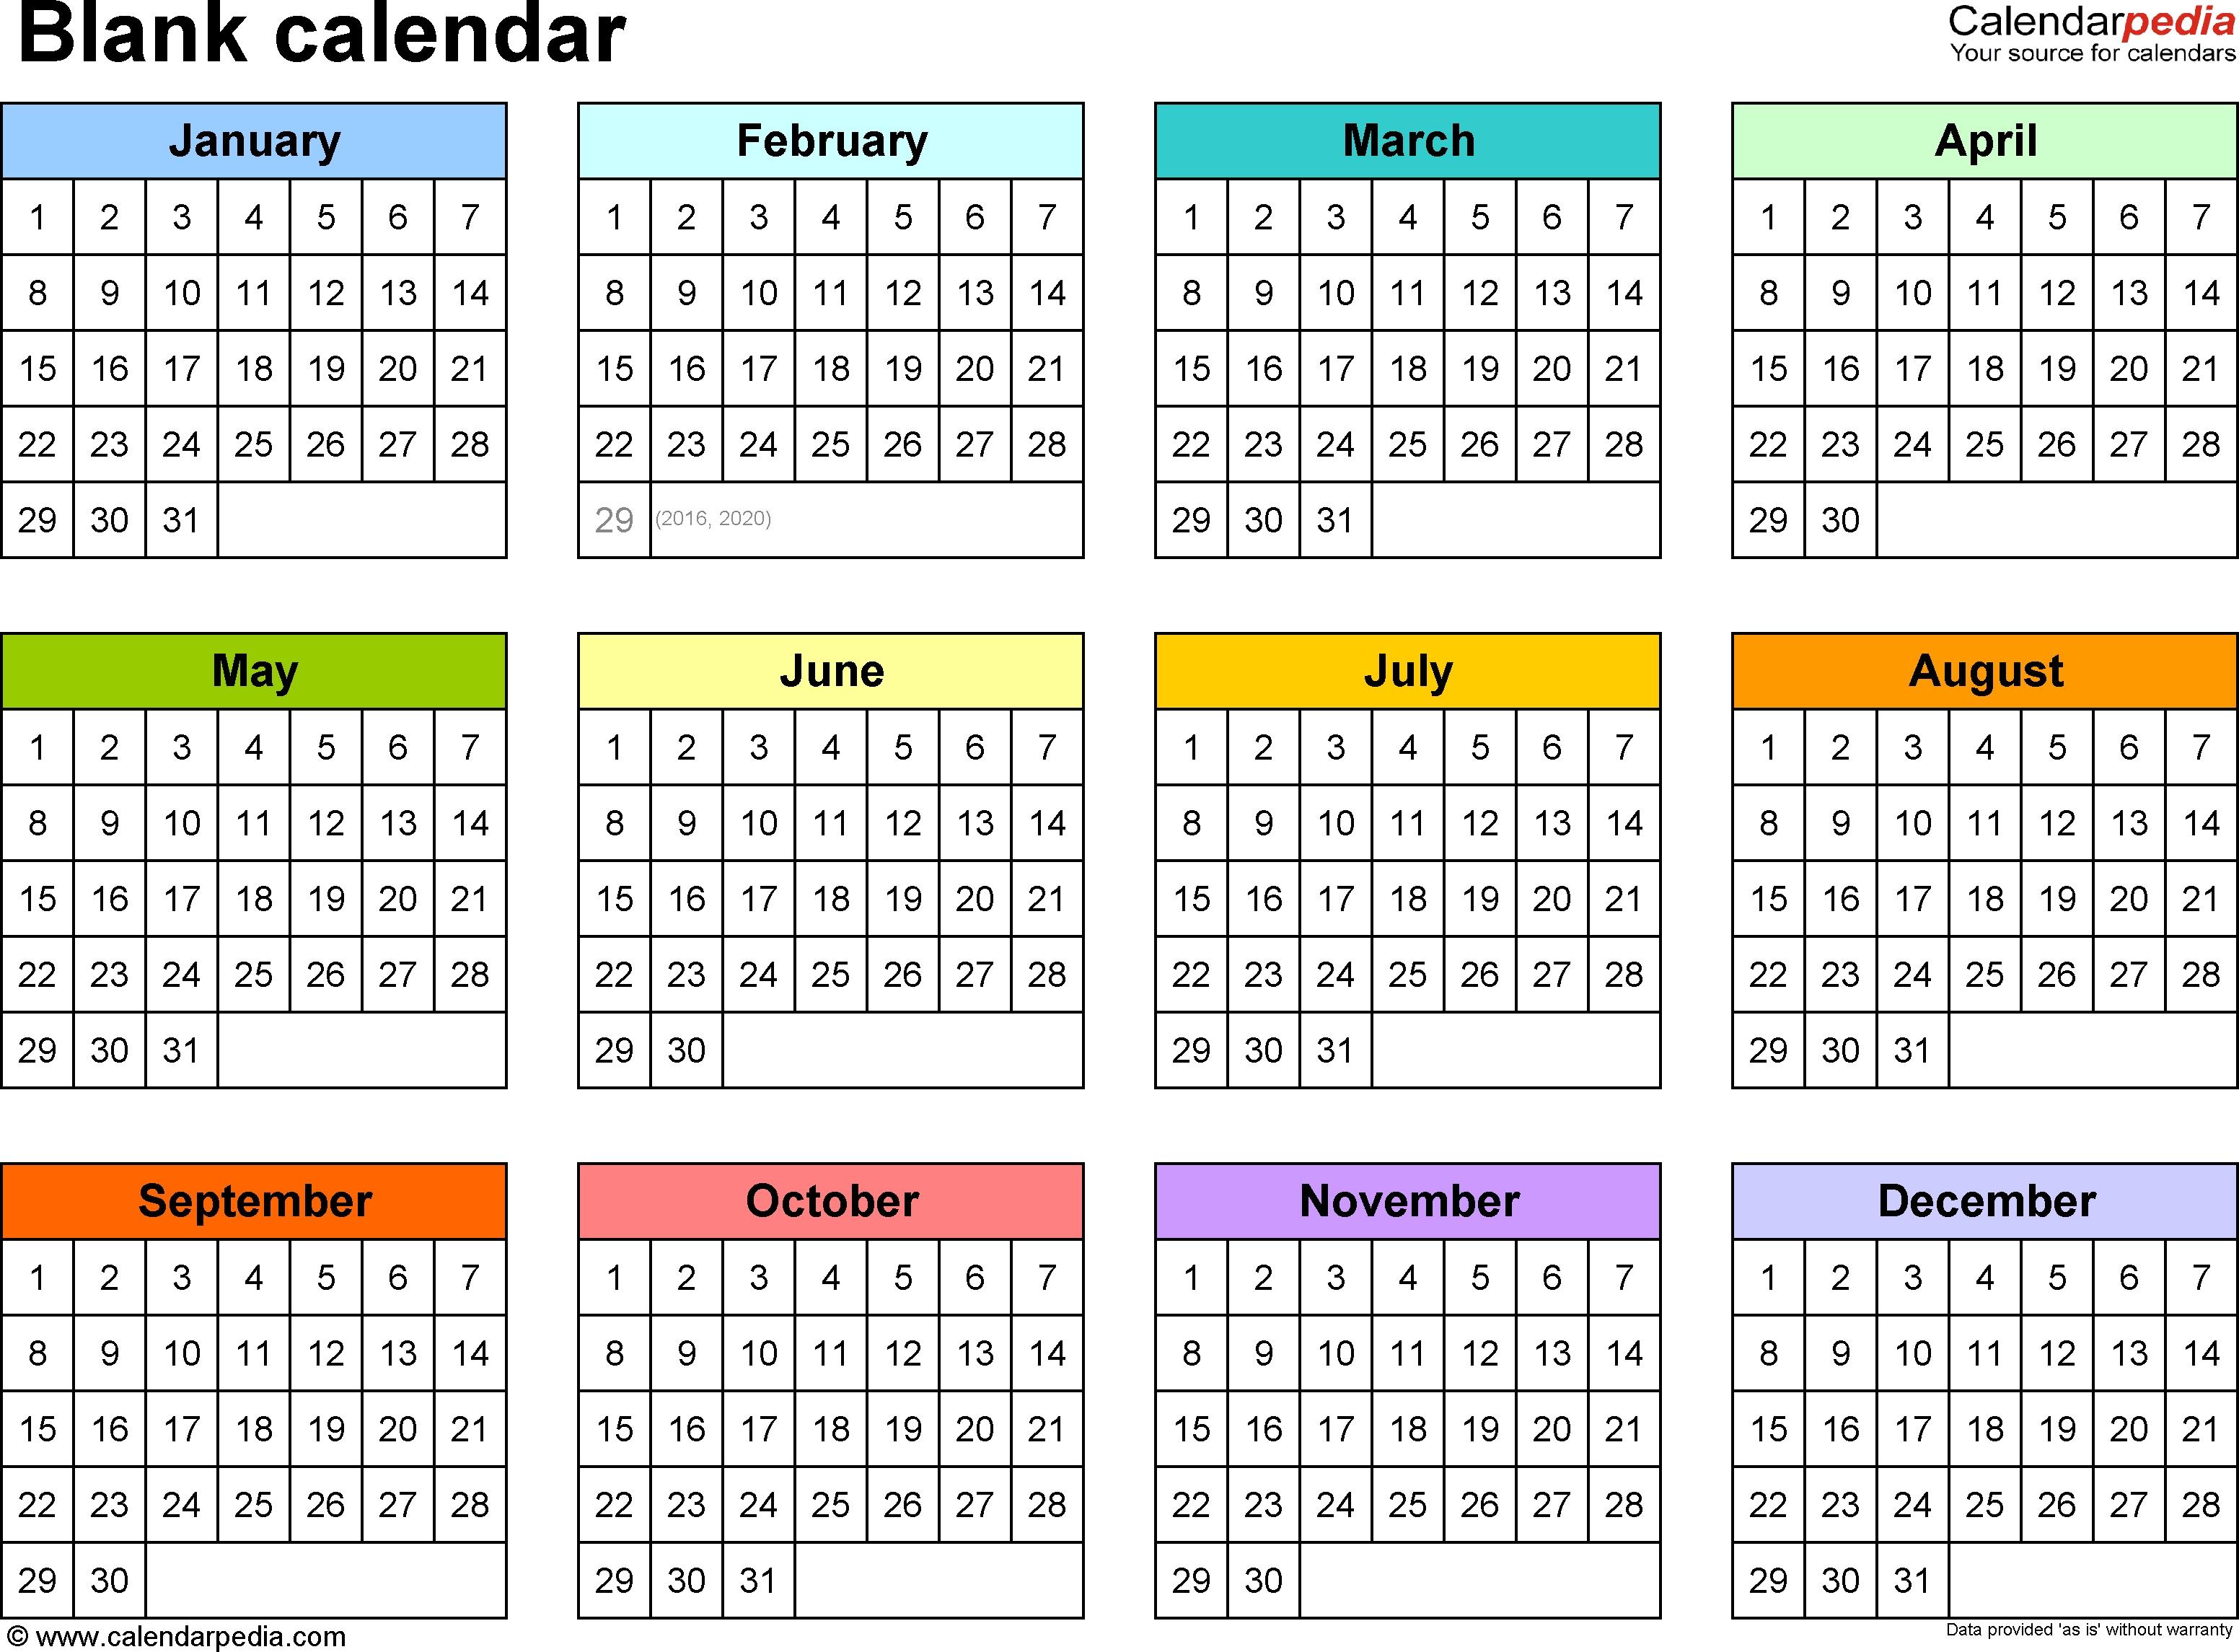 Blank Calendar - 9 Free Printable Microsoft Word Templates  Year At A Glance Calendars Printable